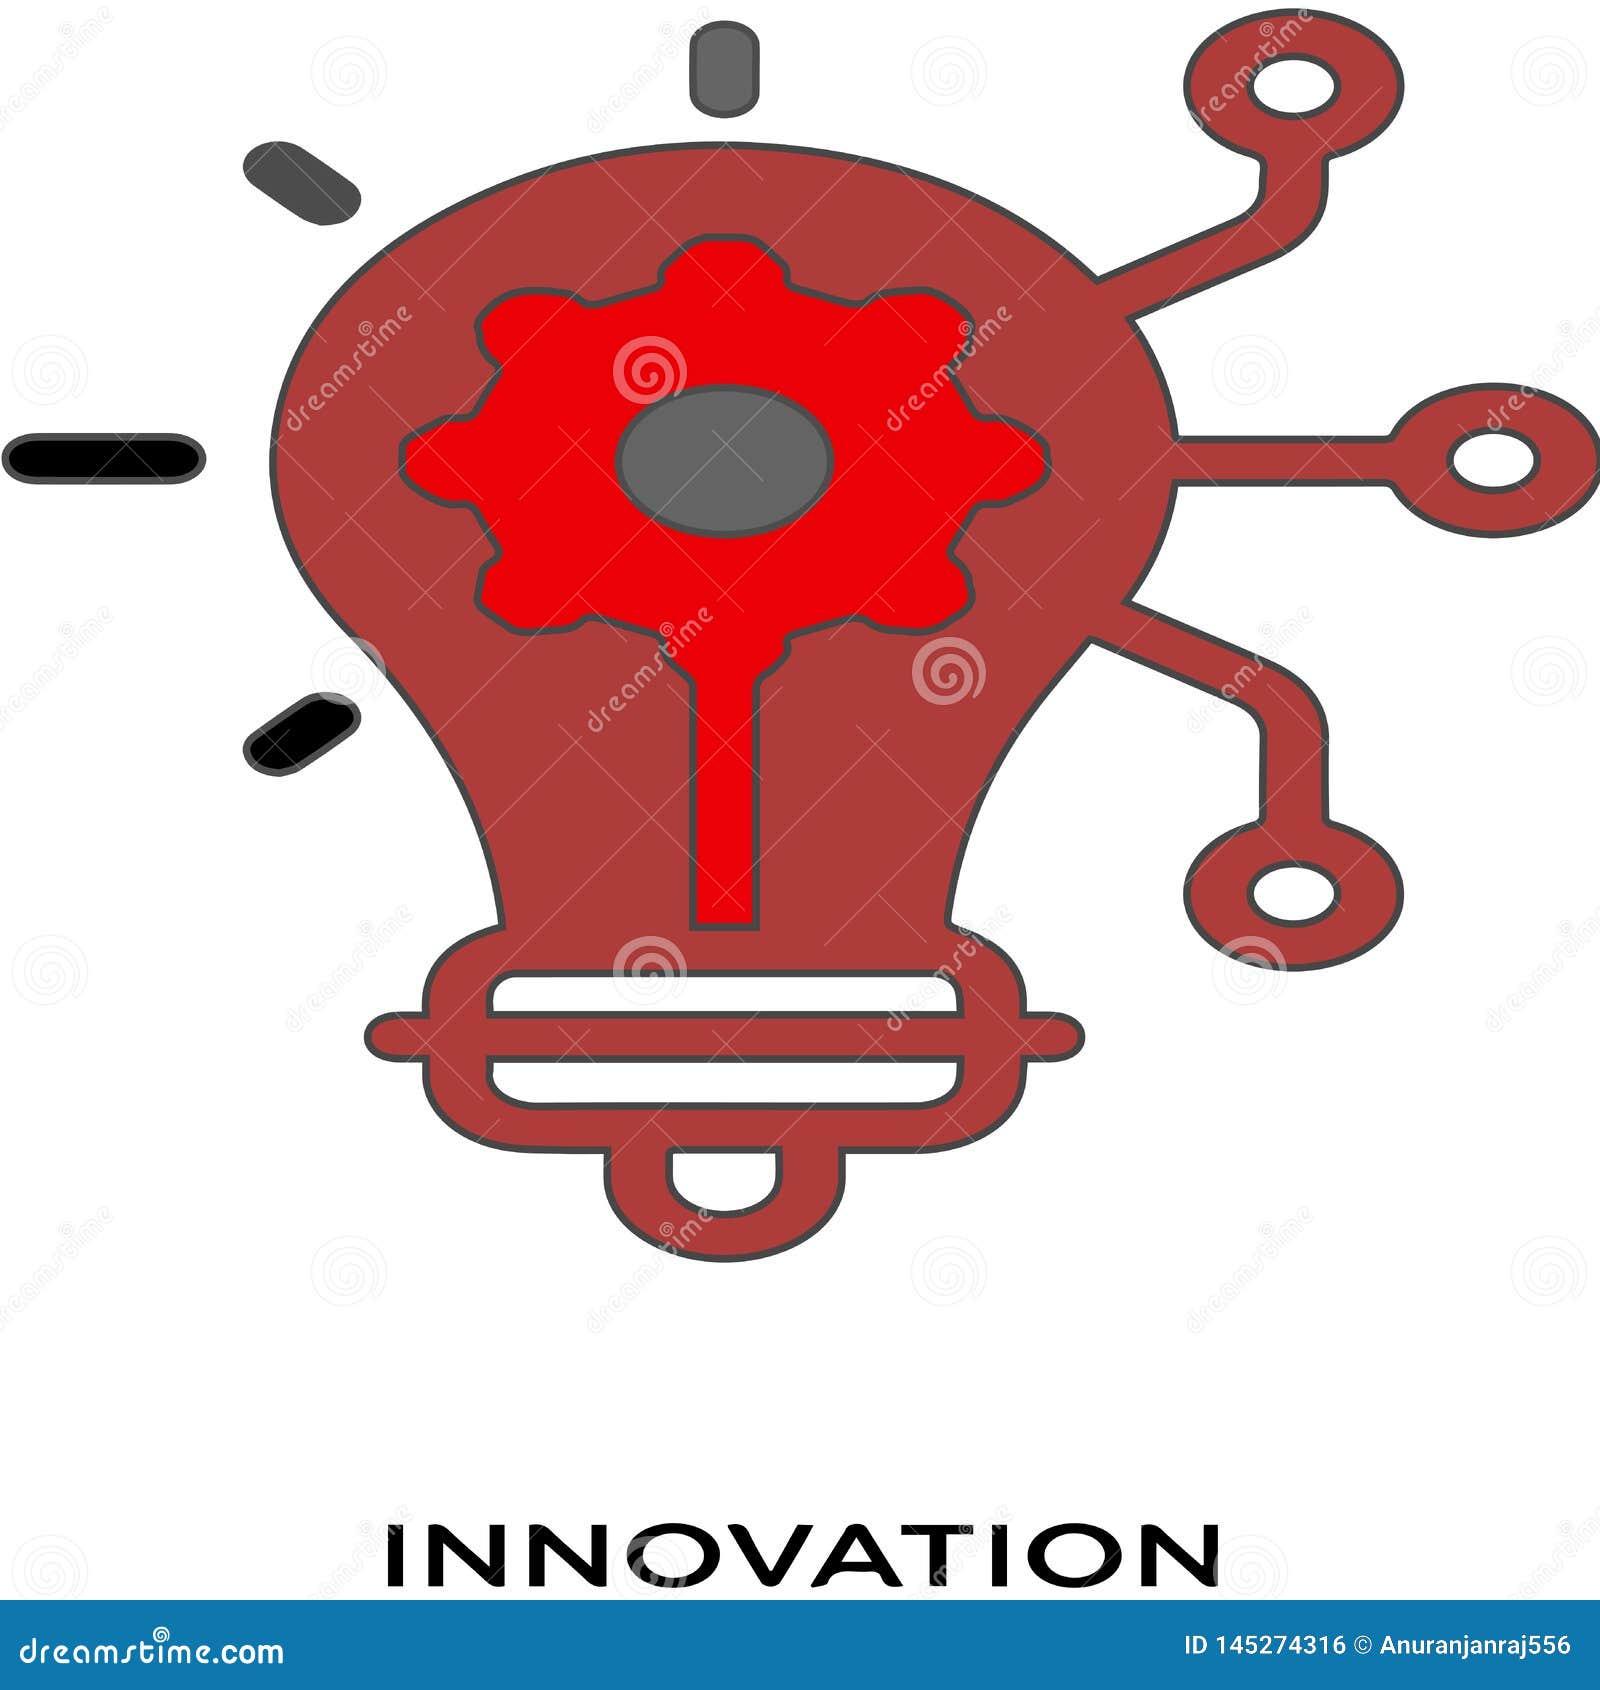 Innovation icon white background simple element illustration marketing concept